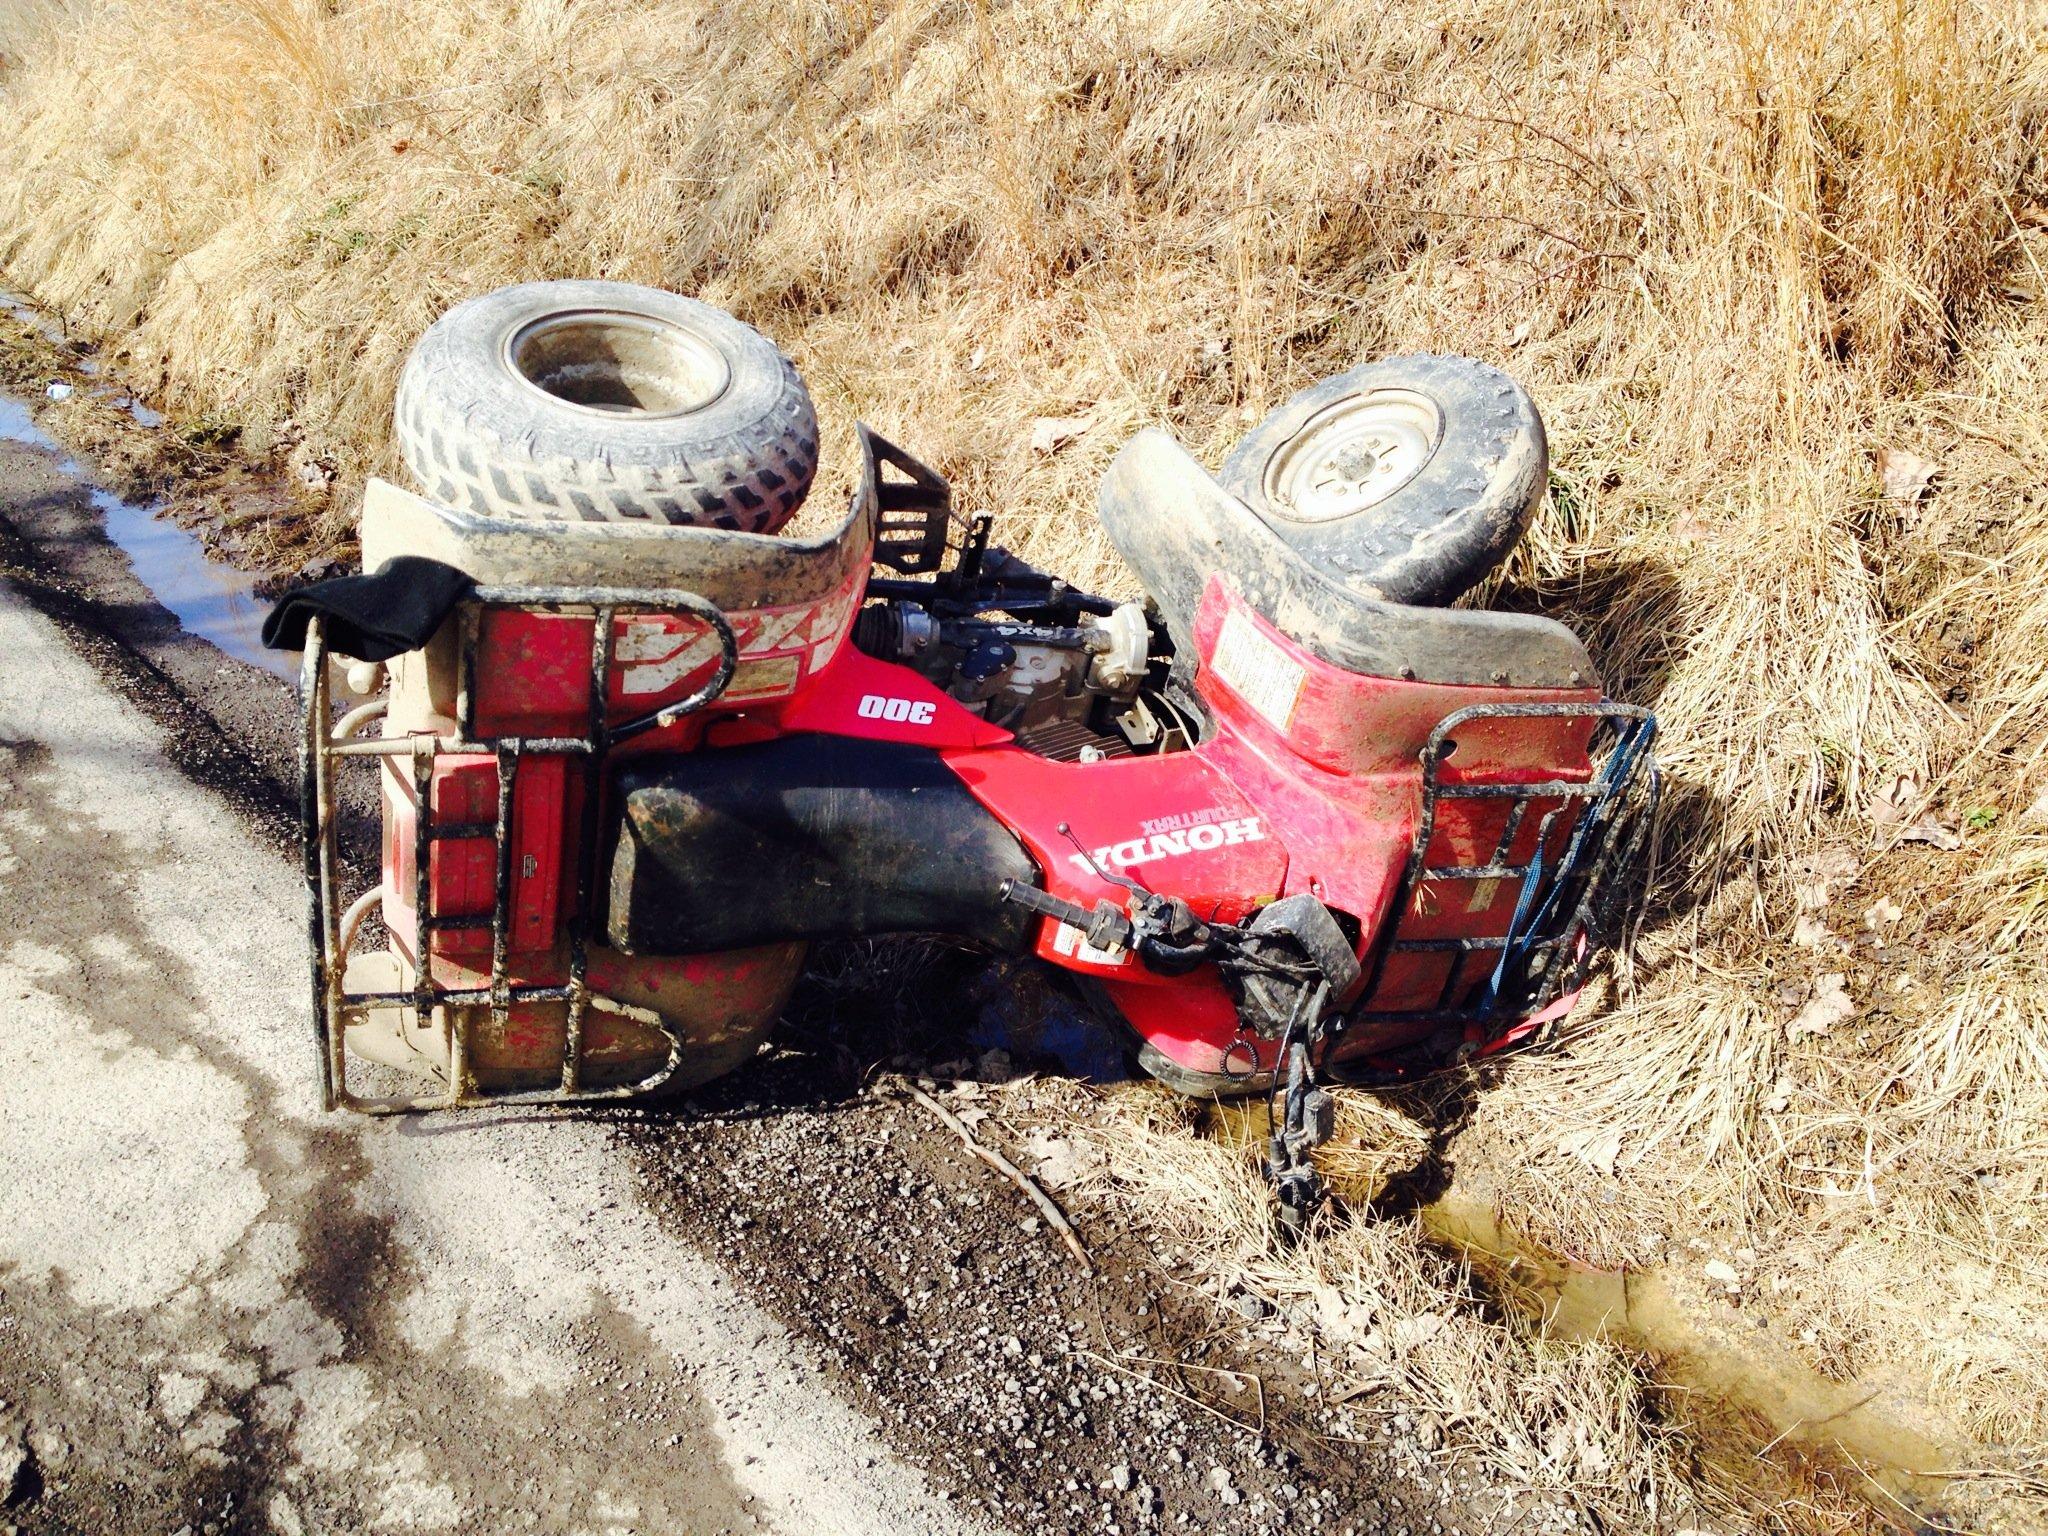 ATV / 4-Wheeler Accident | Goings Law Firm, LLC